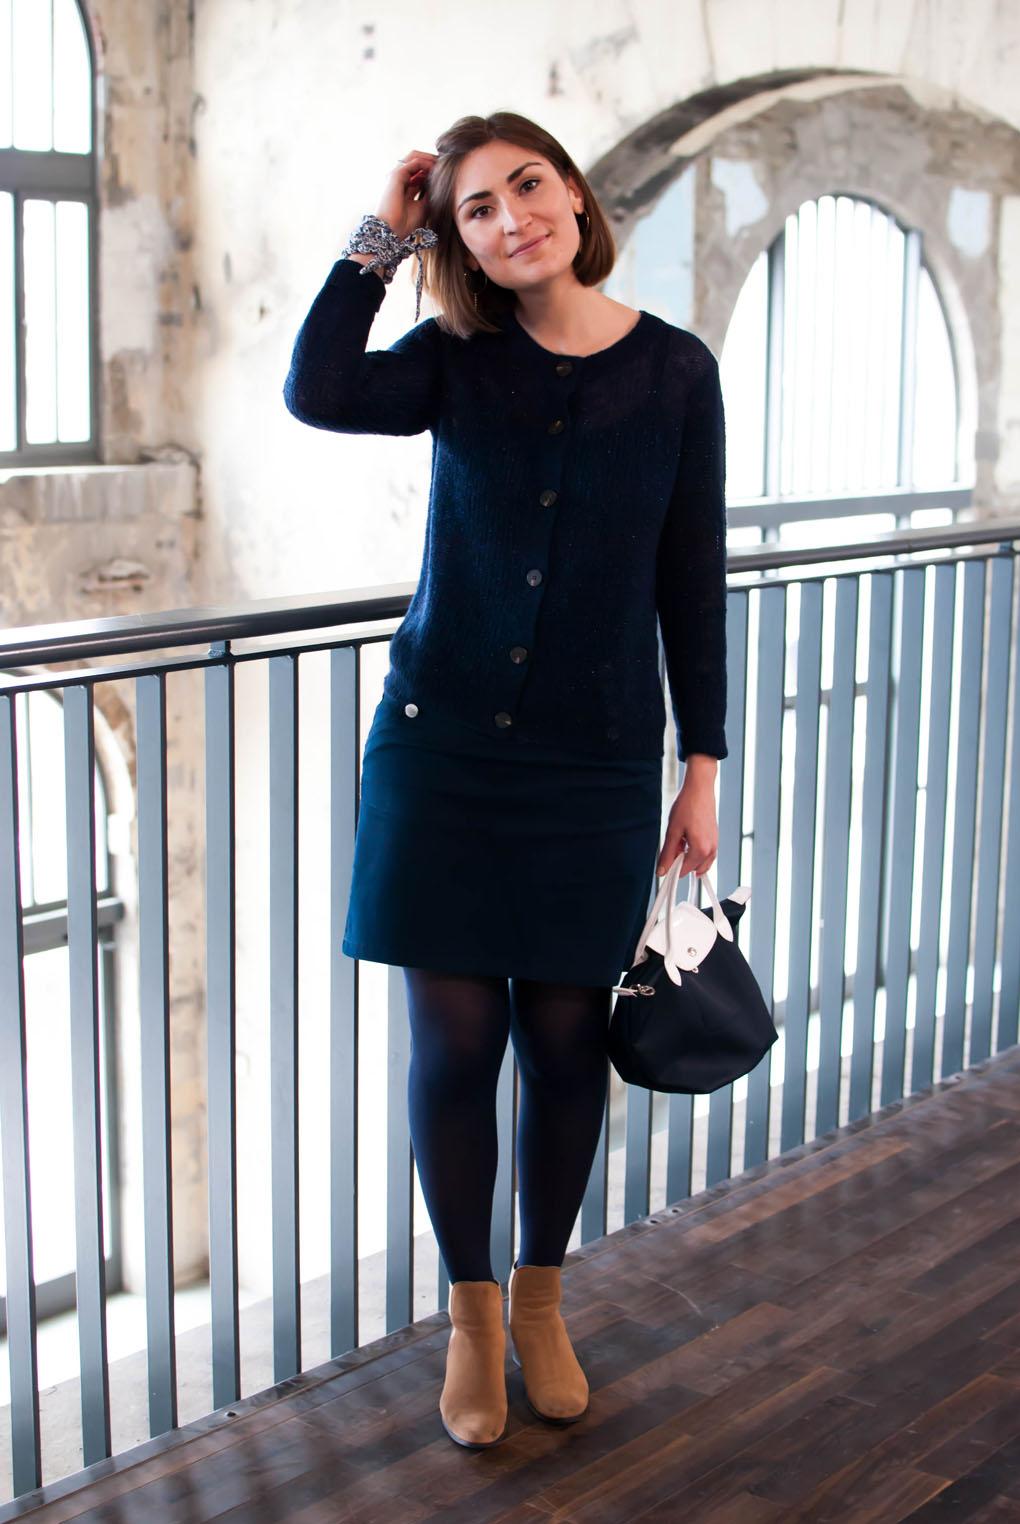 gilet garance fashion mode le petit monde d'elodie